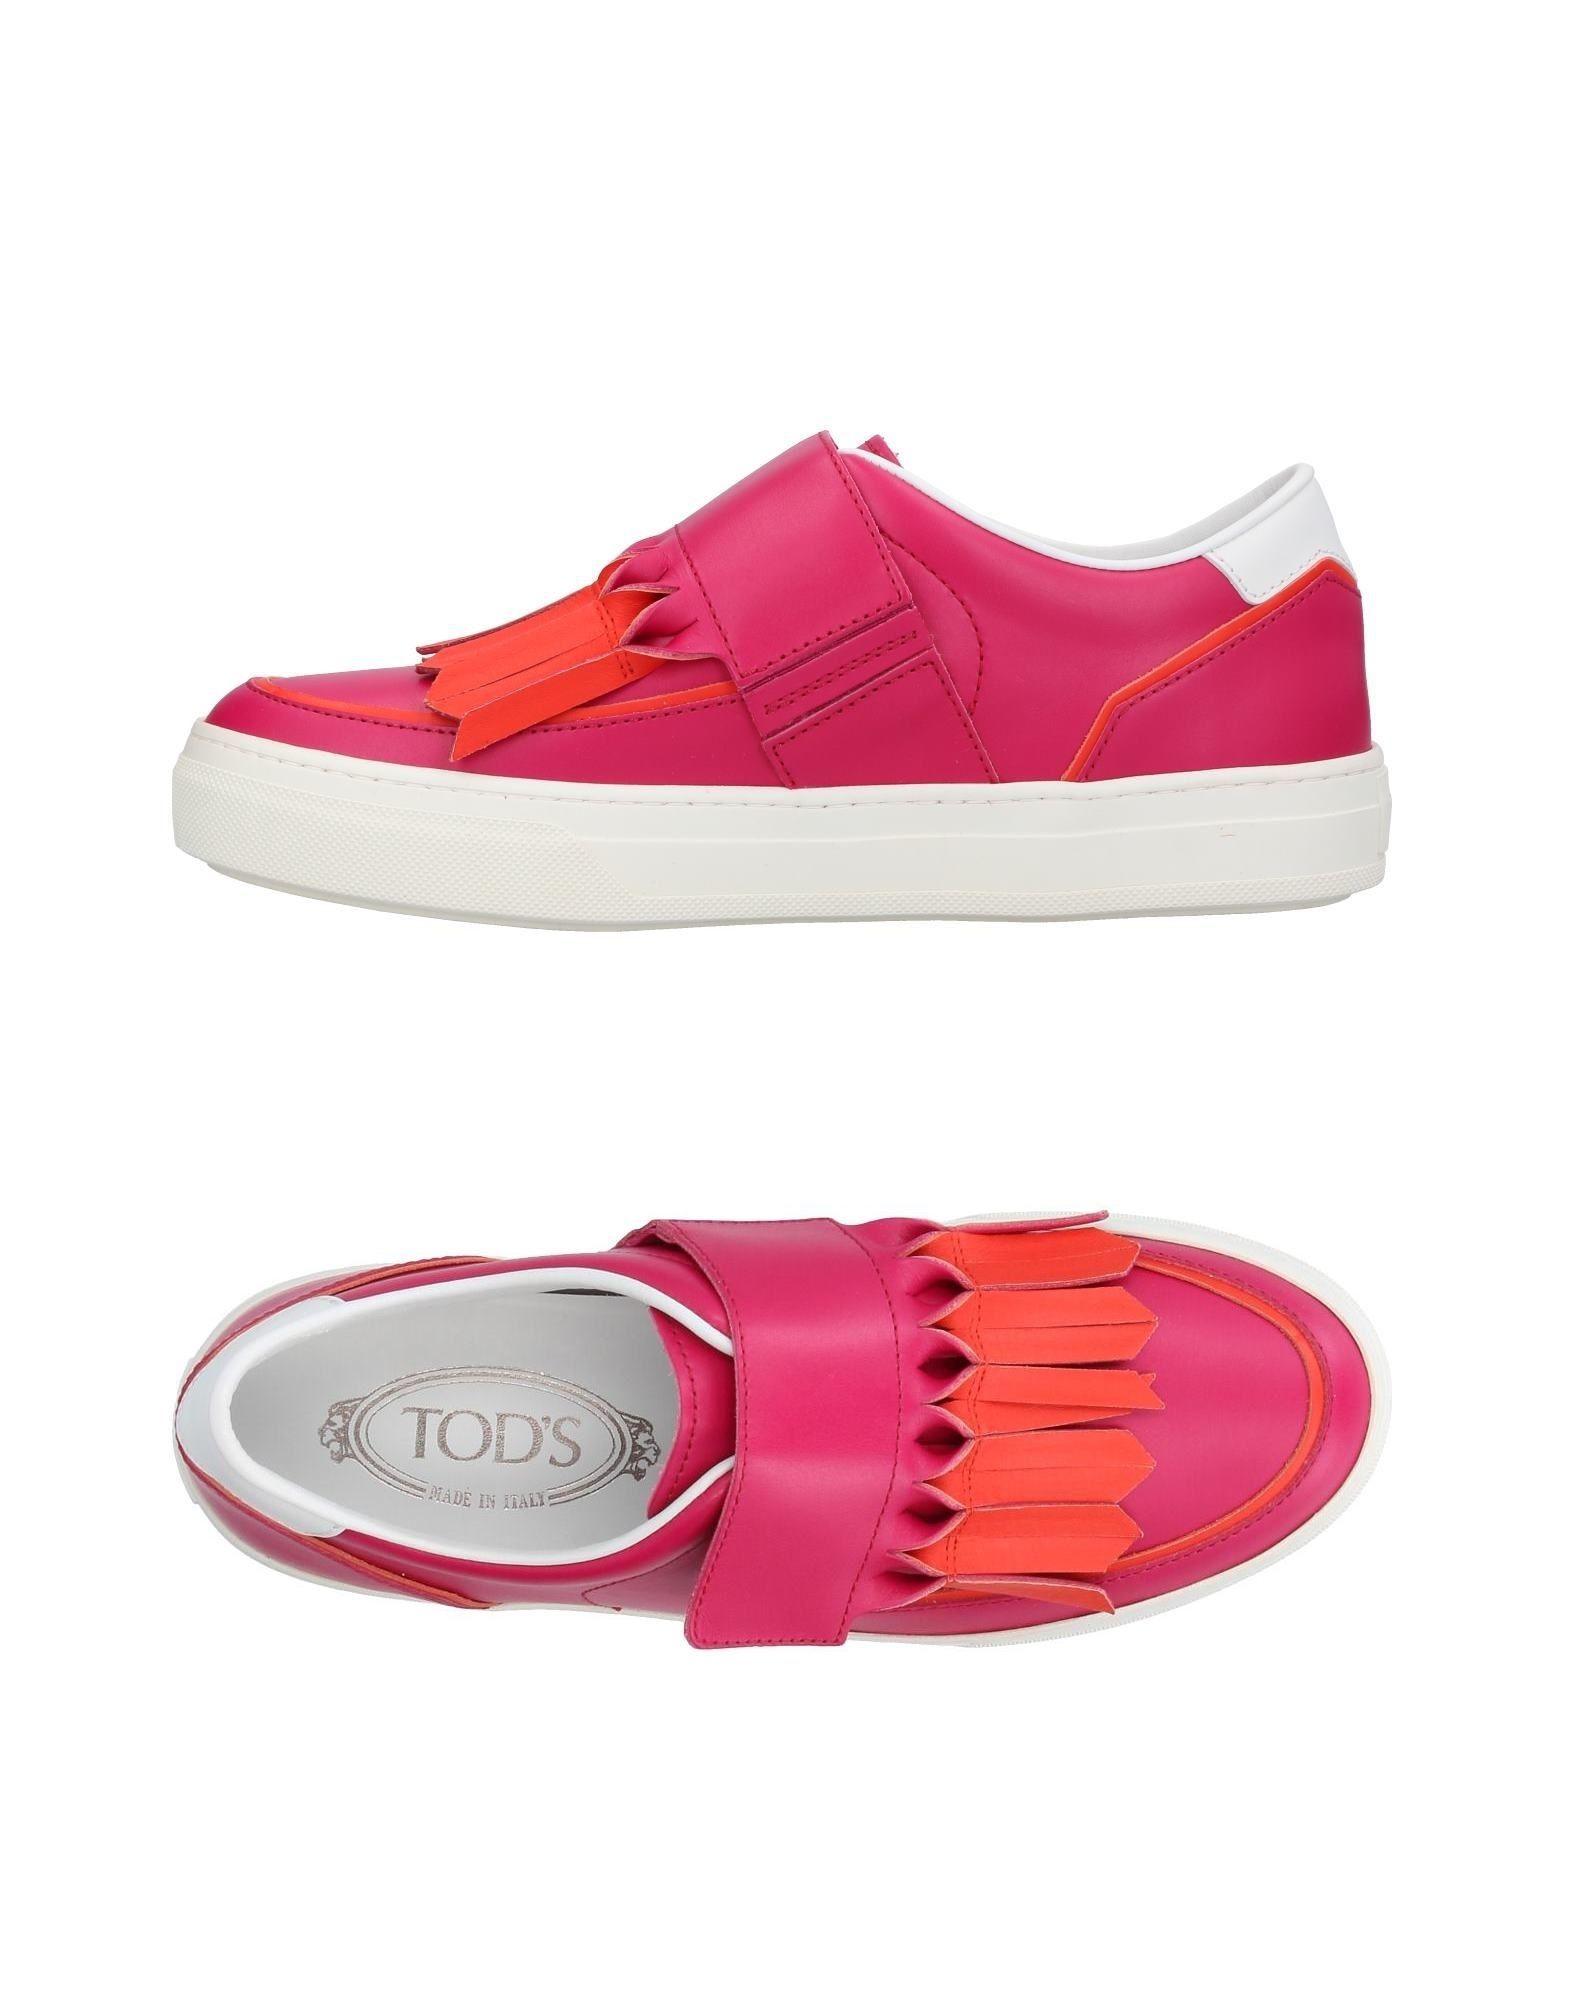 Tod's Sneakers Damen  11397805MGGut aussehende strapazierfähige Schuhe